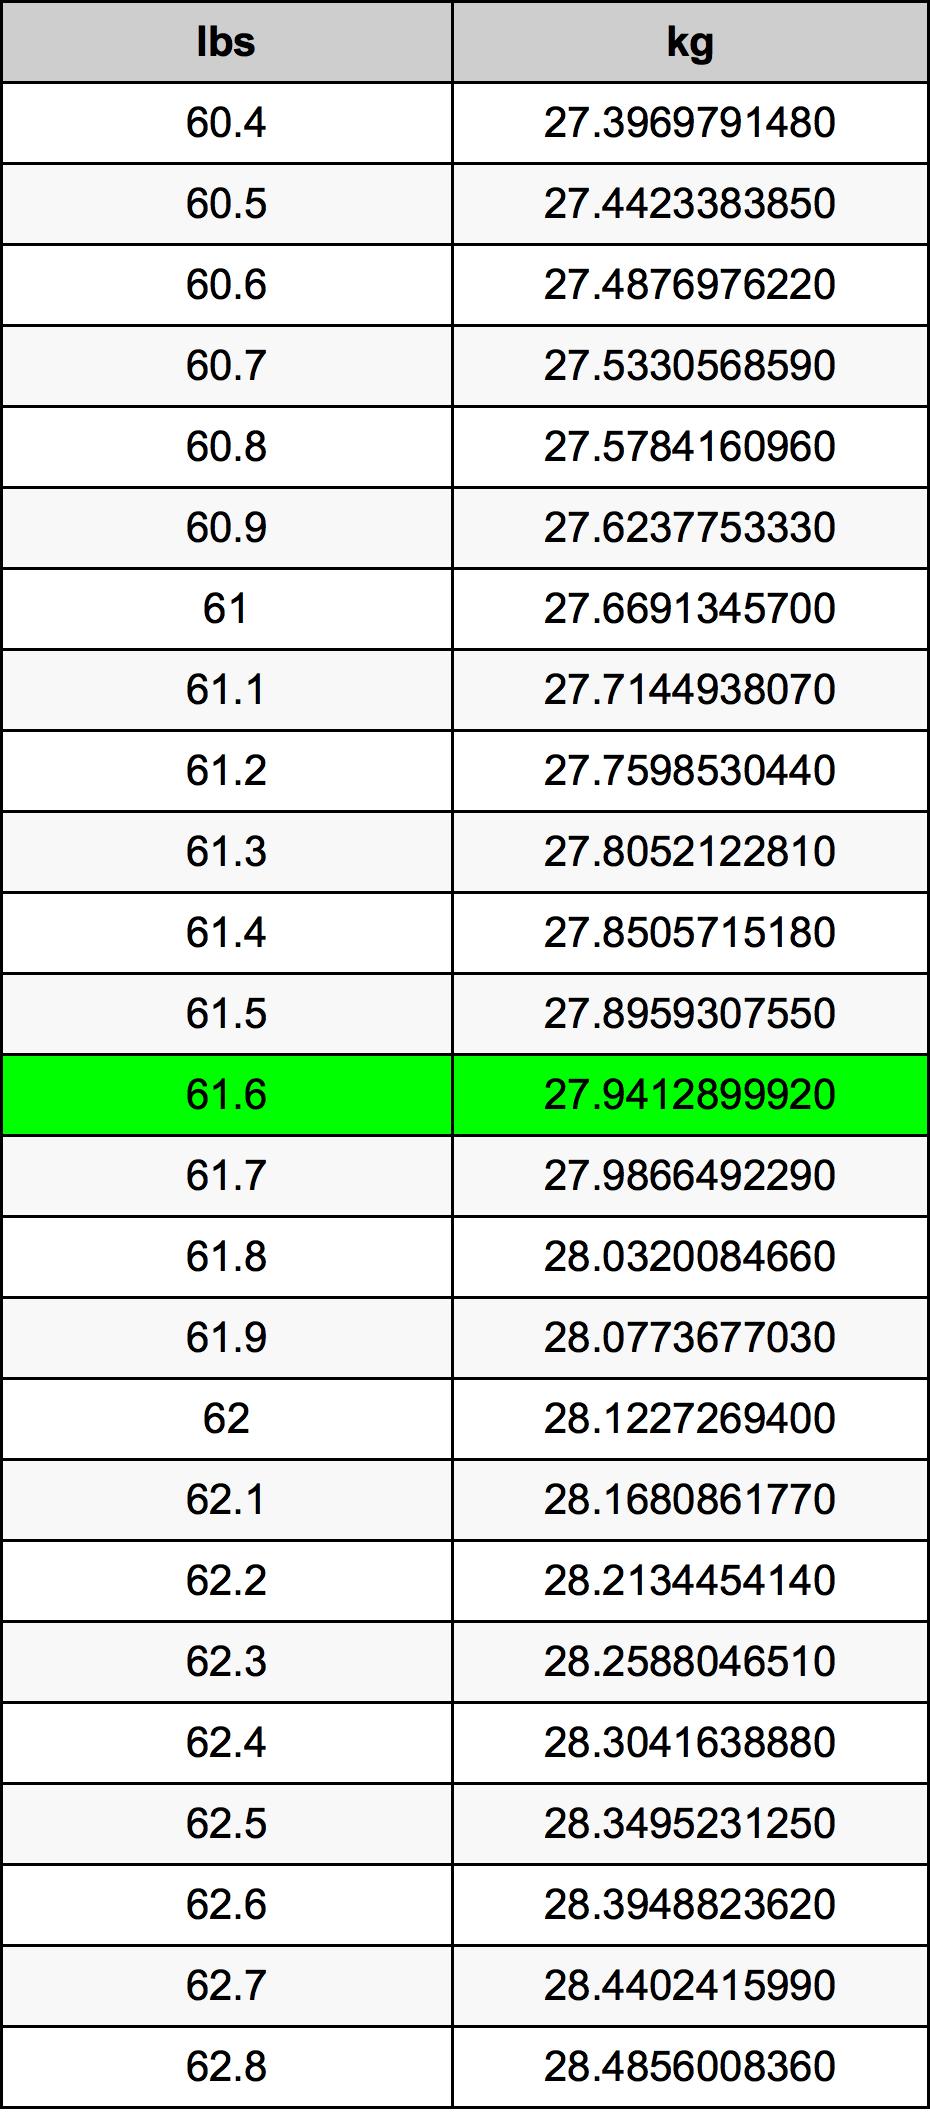 61.6 Libra konverteringstabellen